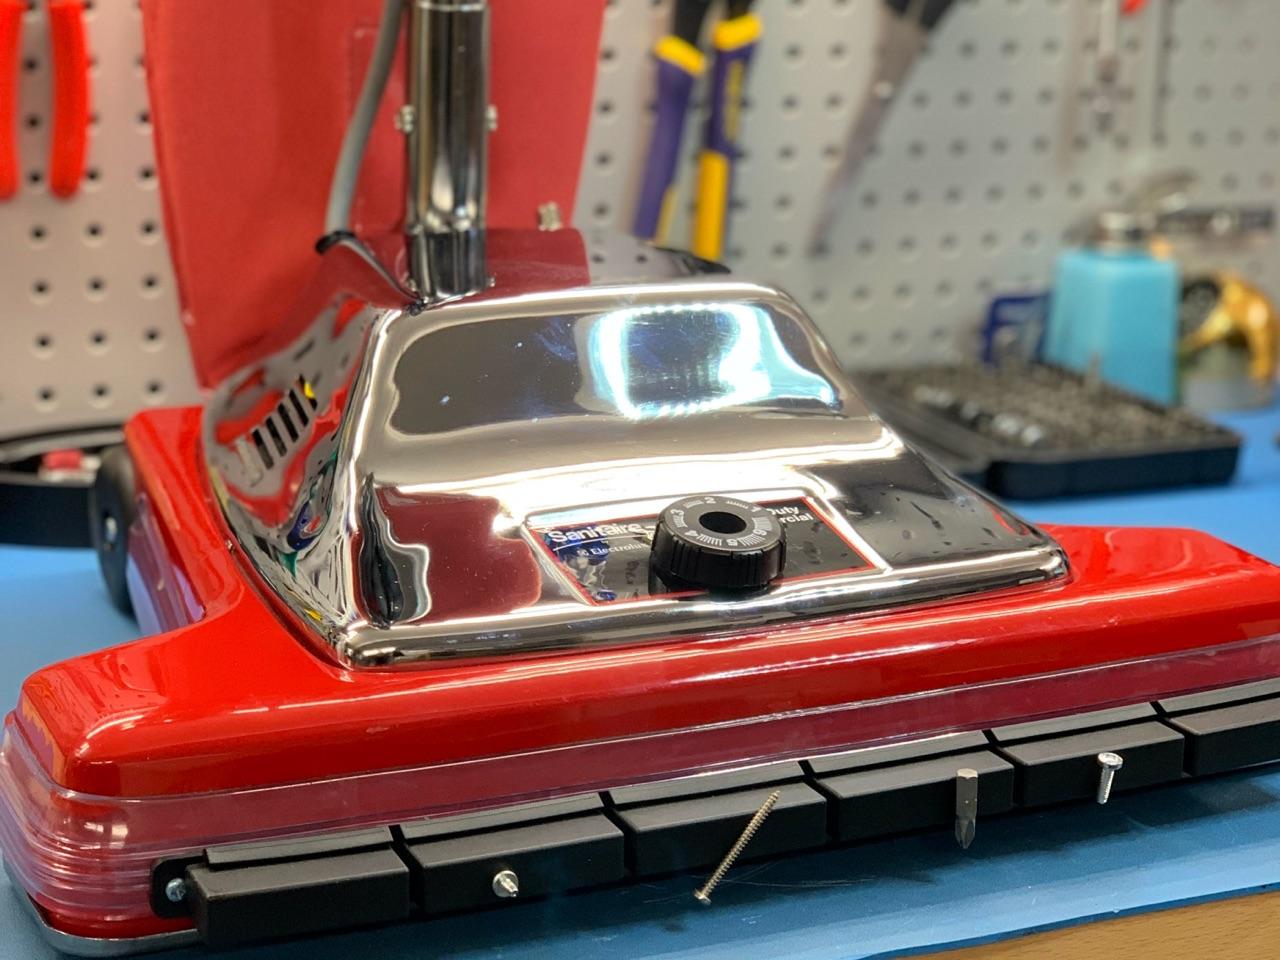 commercial vacuum after repair